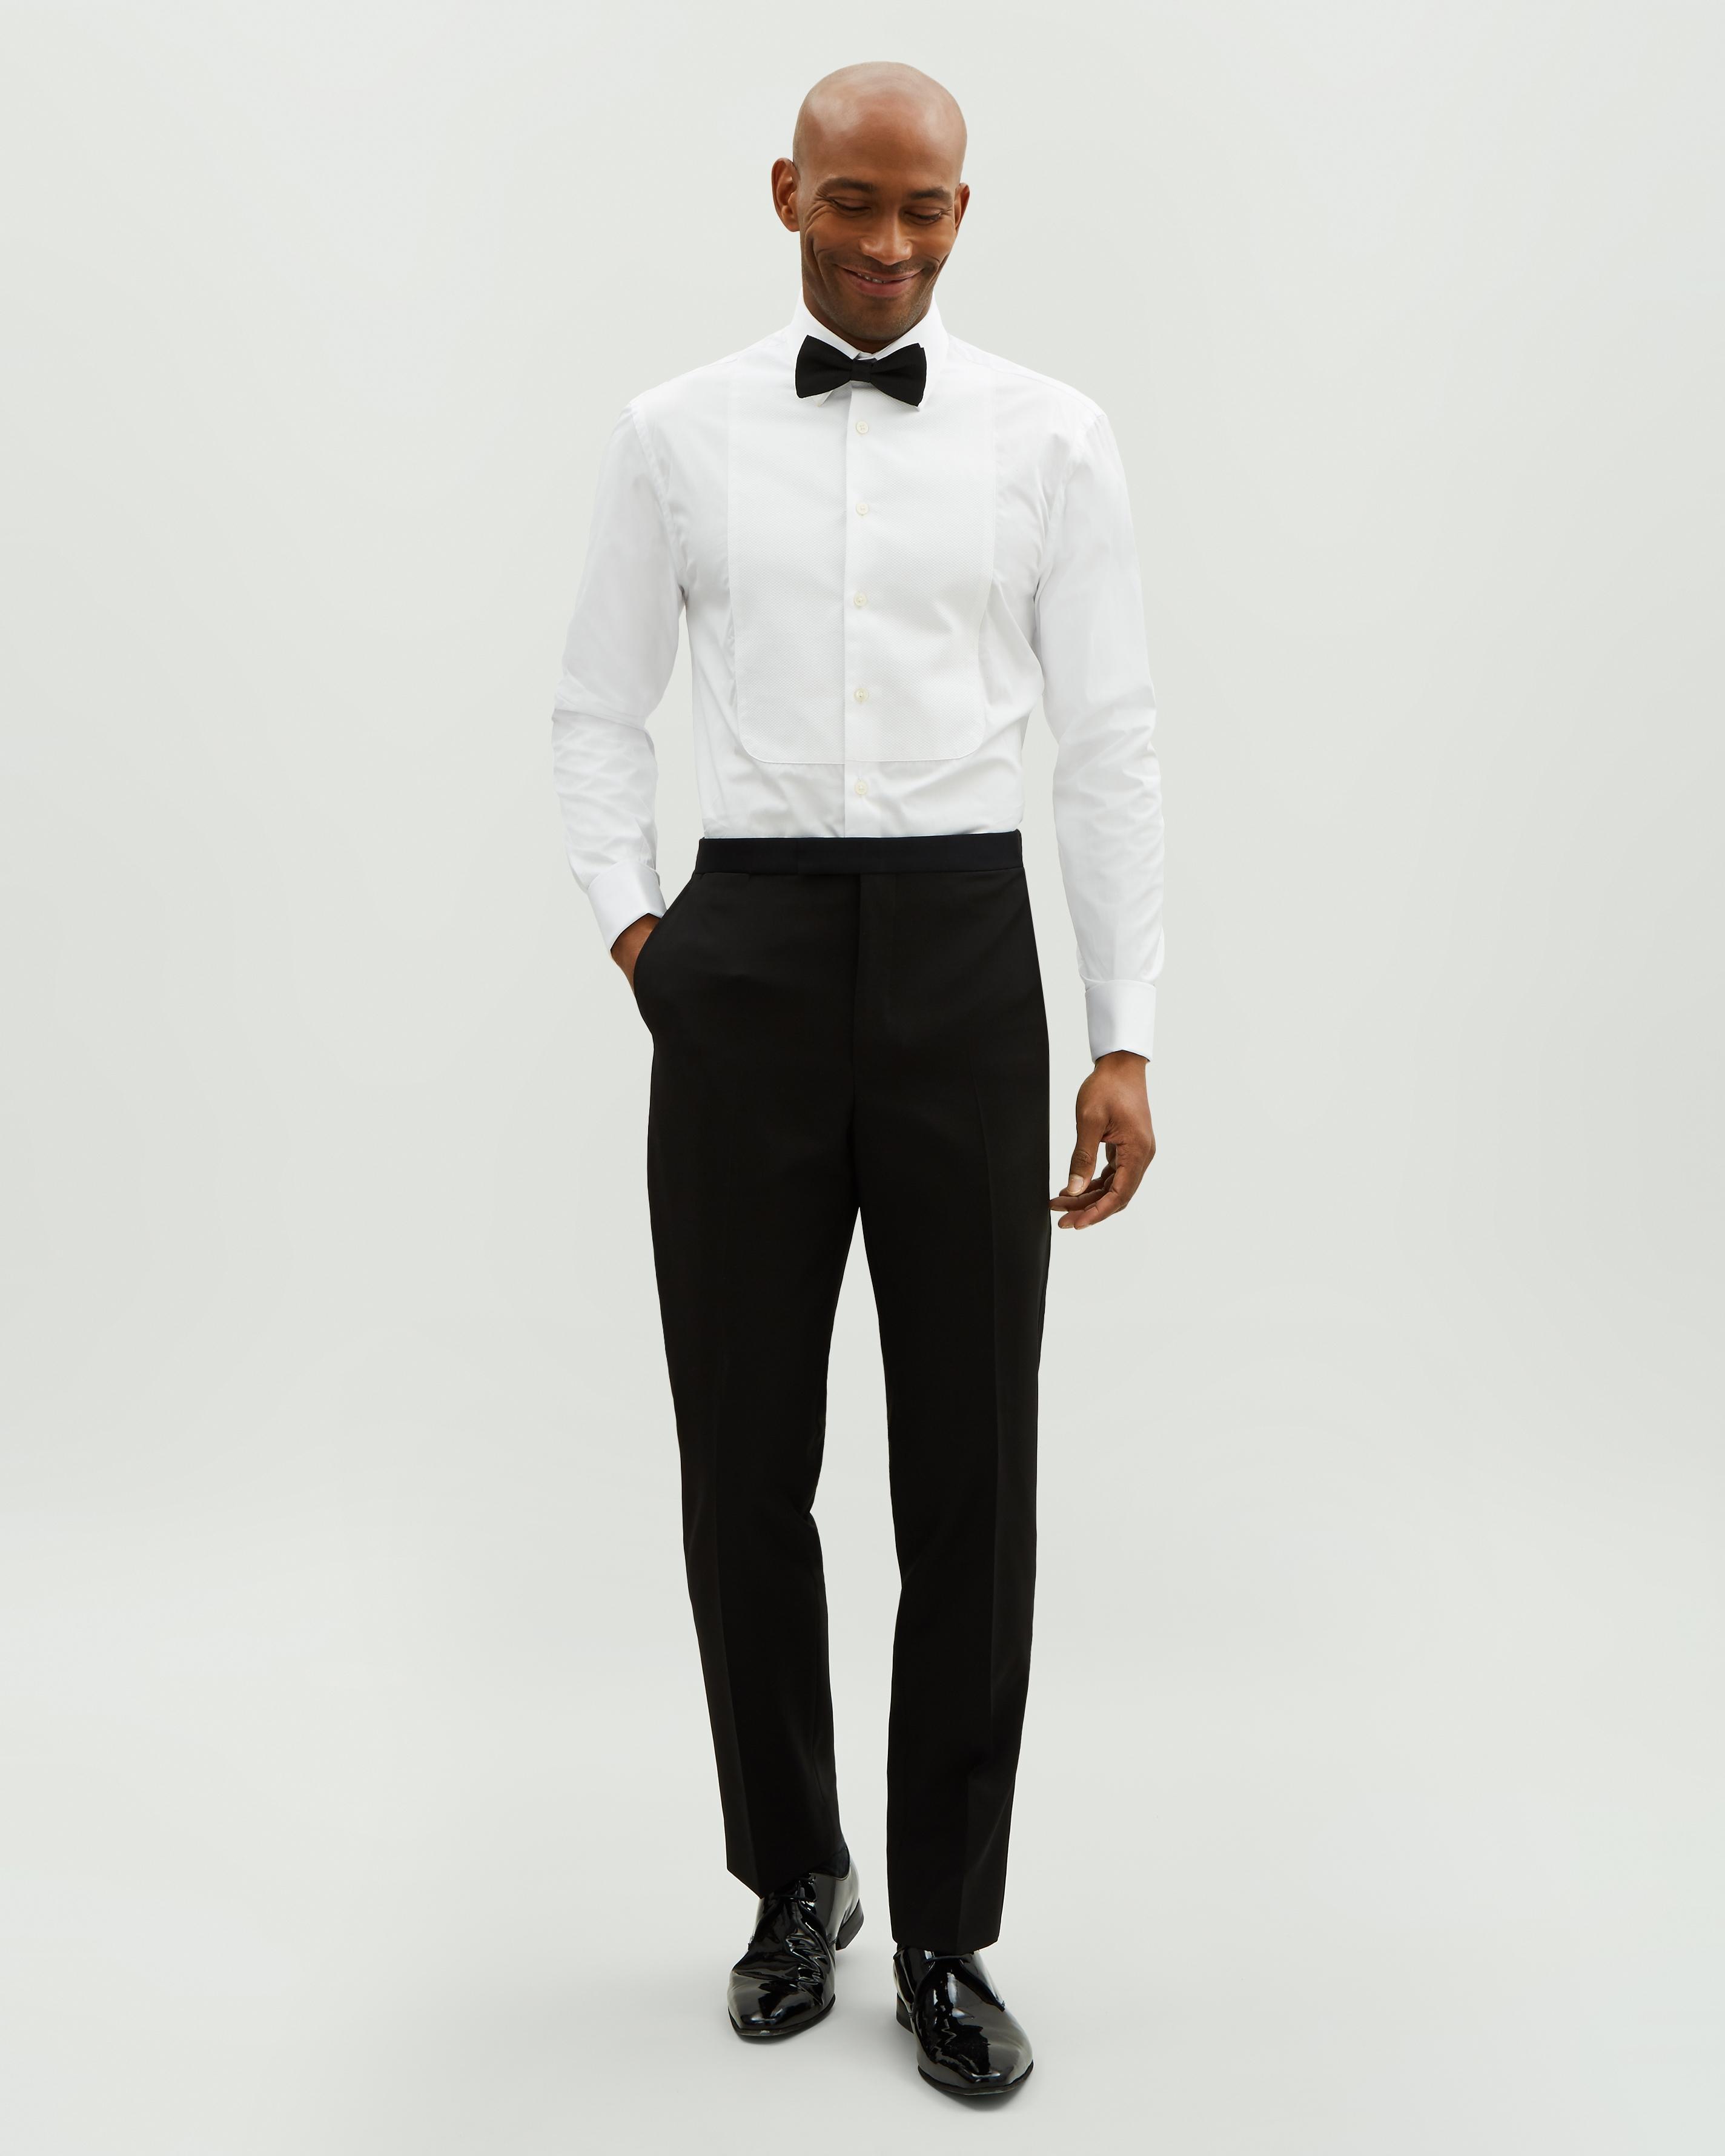 6d716a40559 Jaeger Cotton Evening Marcella Regular Bib Shirt in White for Men - Save  38% - Lyst